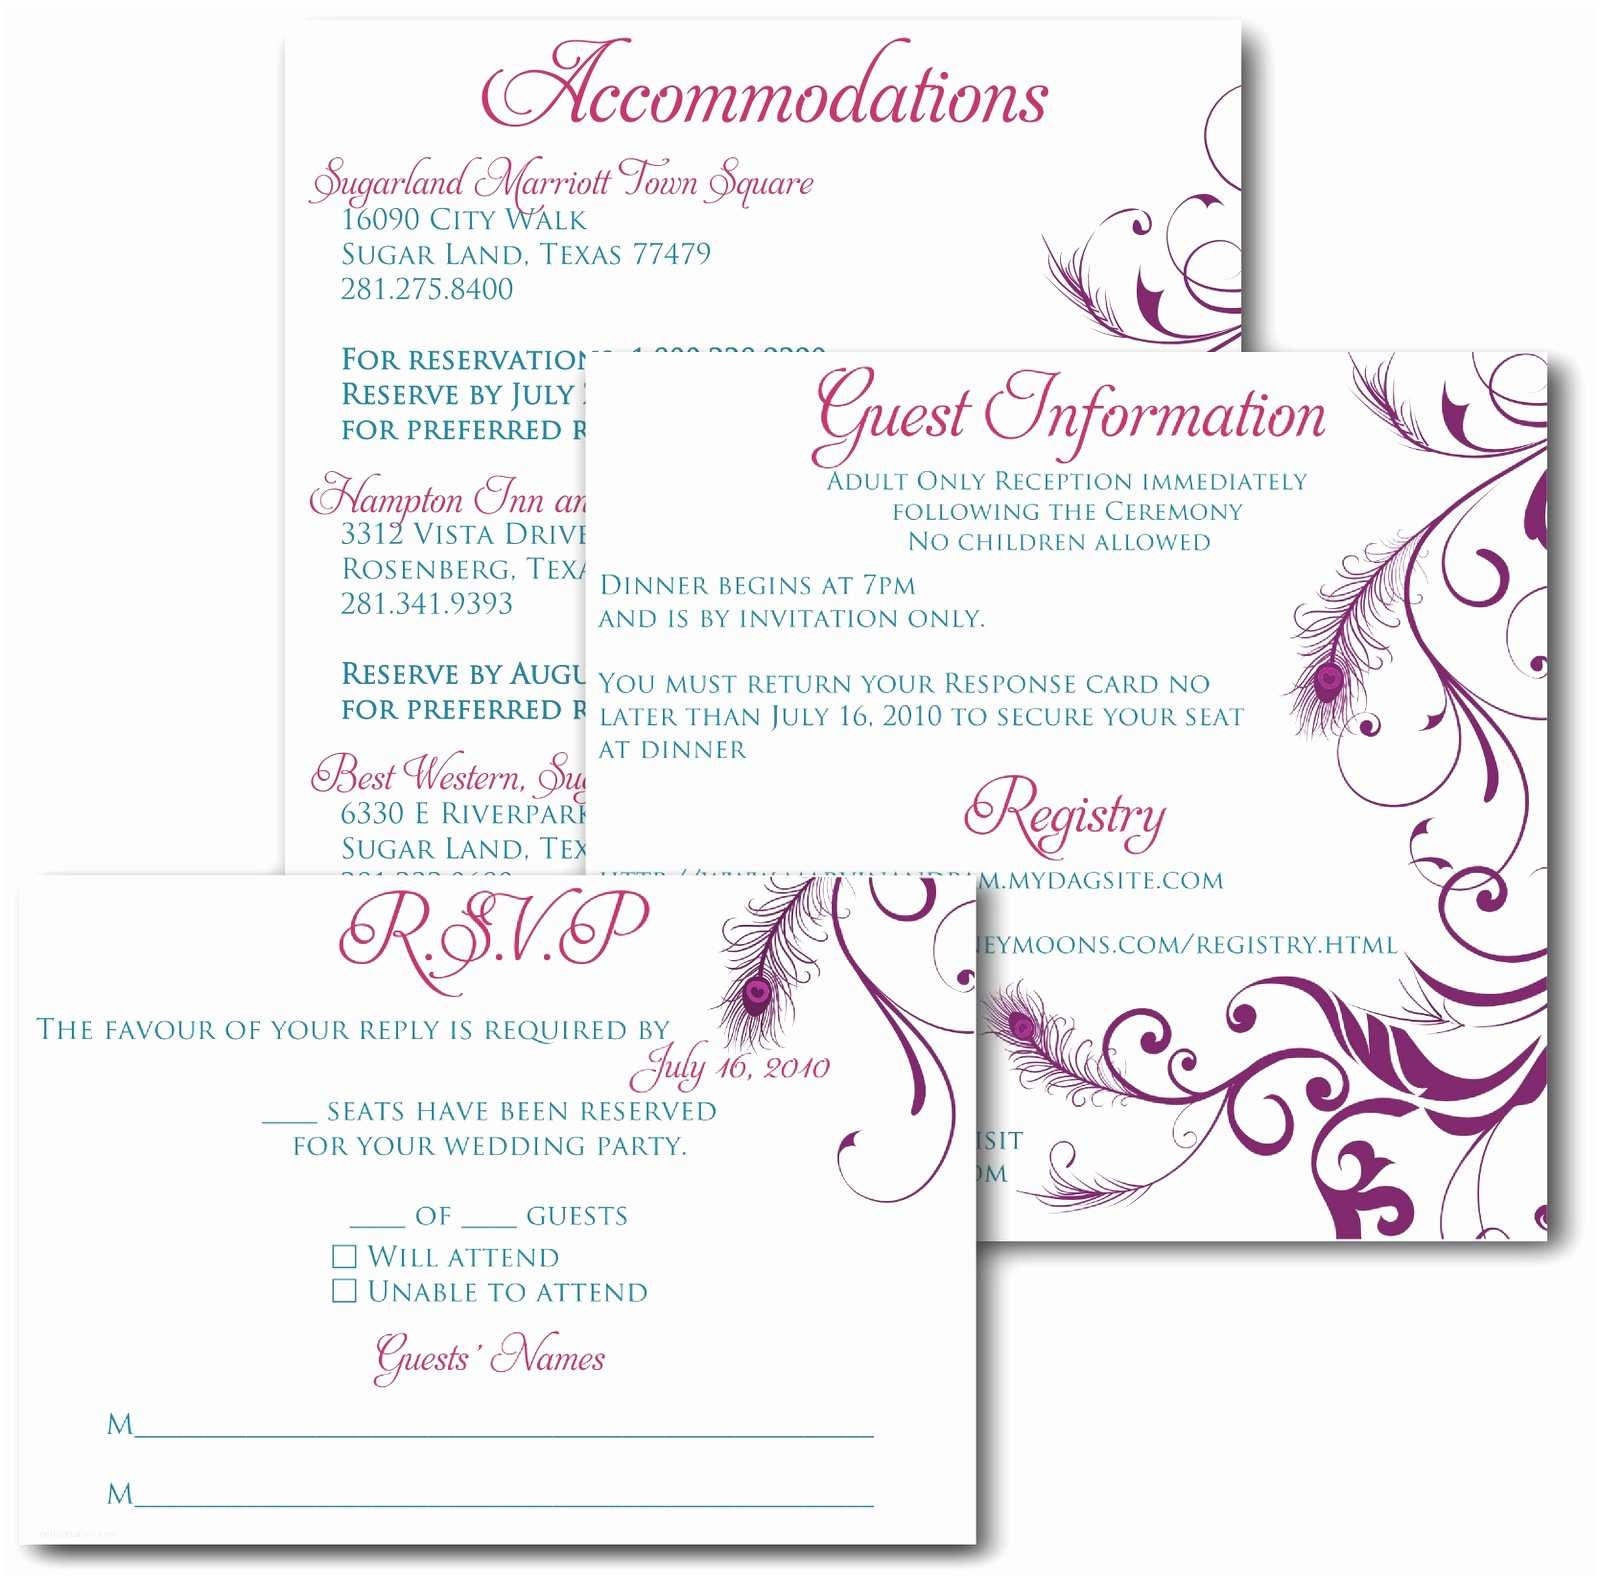 Wedding Invitation Insert Templates Wedding Invitation Insert Templates